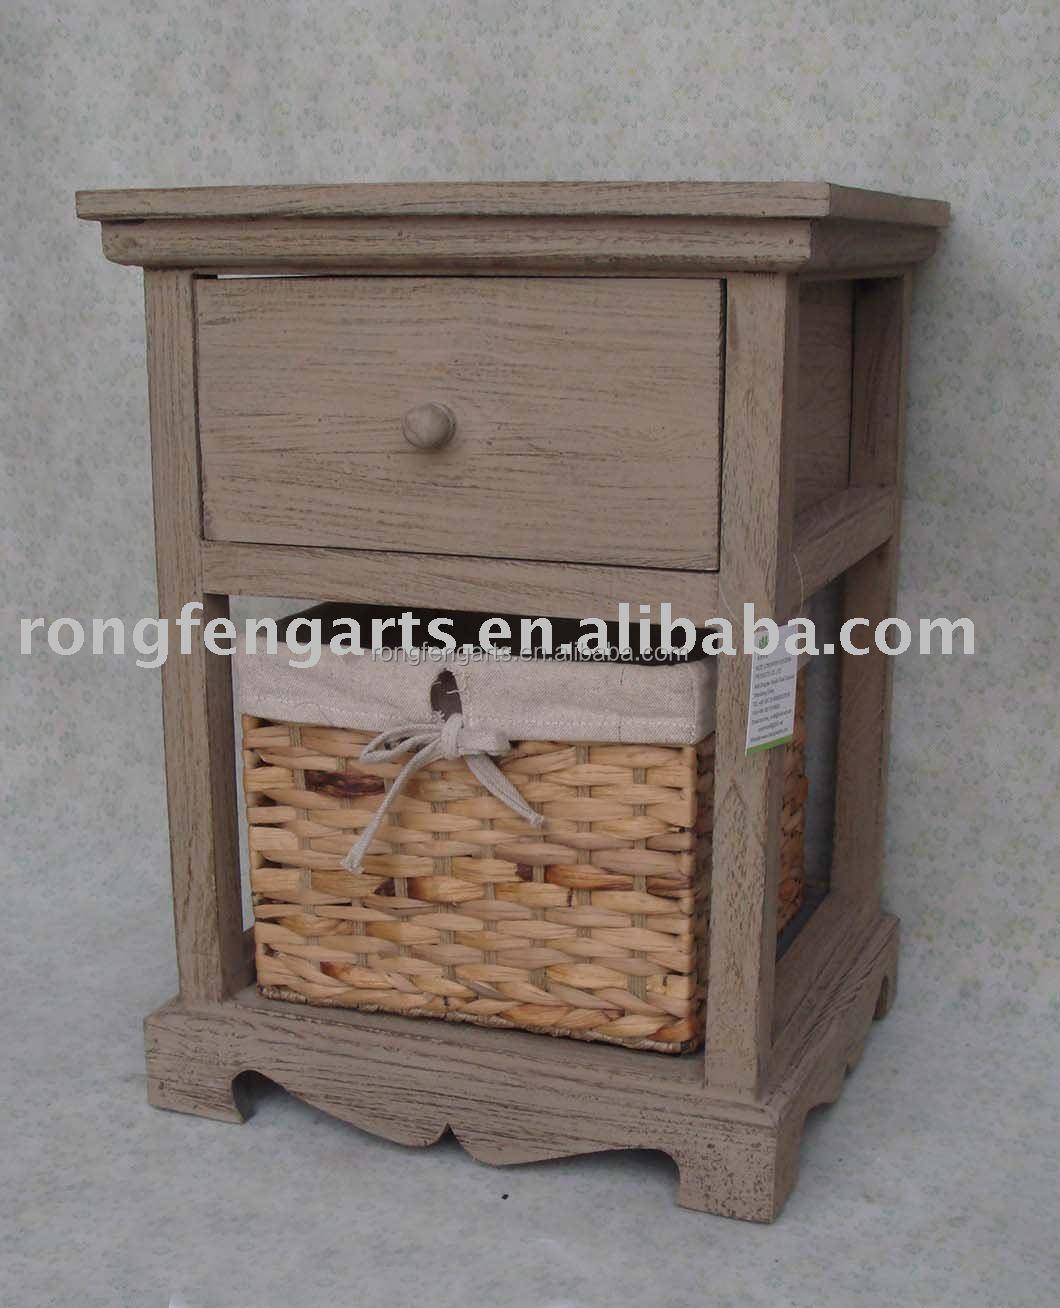 grossiste meuble avec panier osier acheter les meilleurs. Black Bedroom Furniture Sets. Home Design Ideas